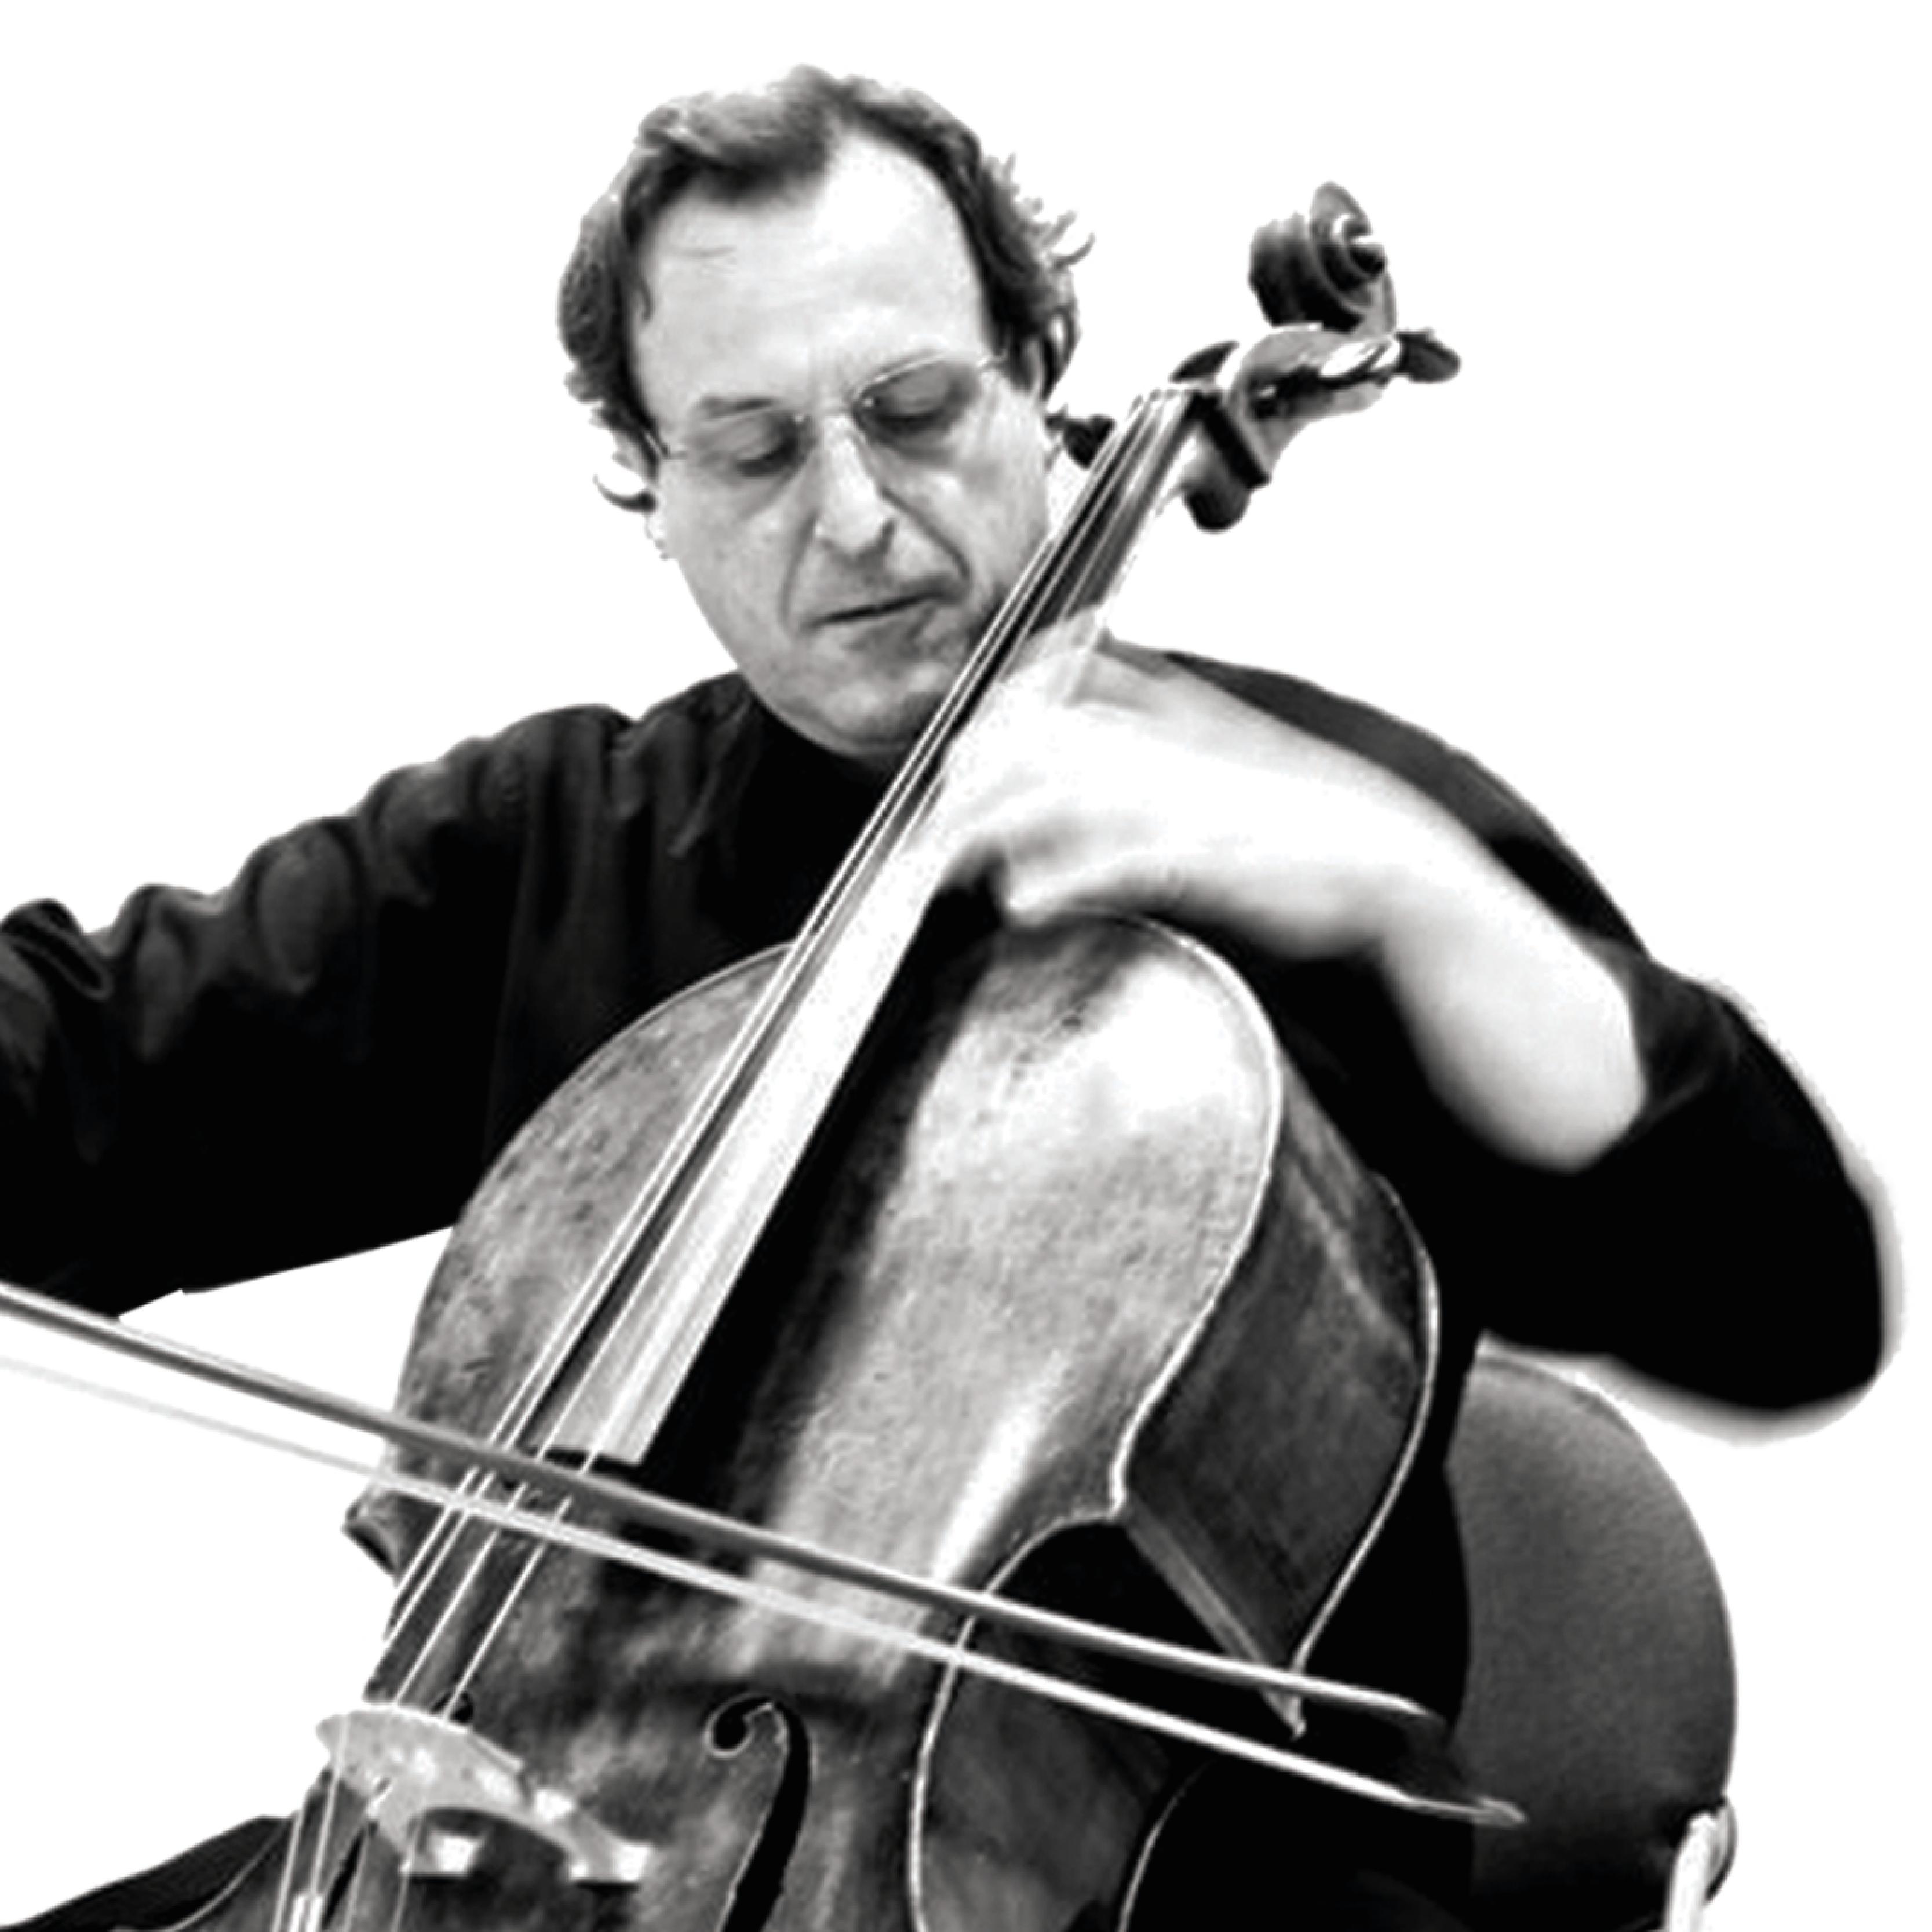 Dario Destefano